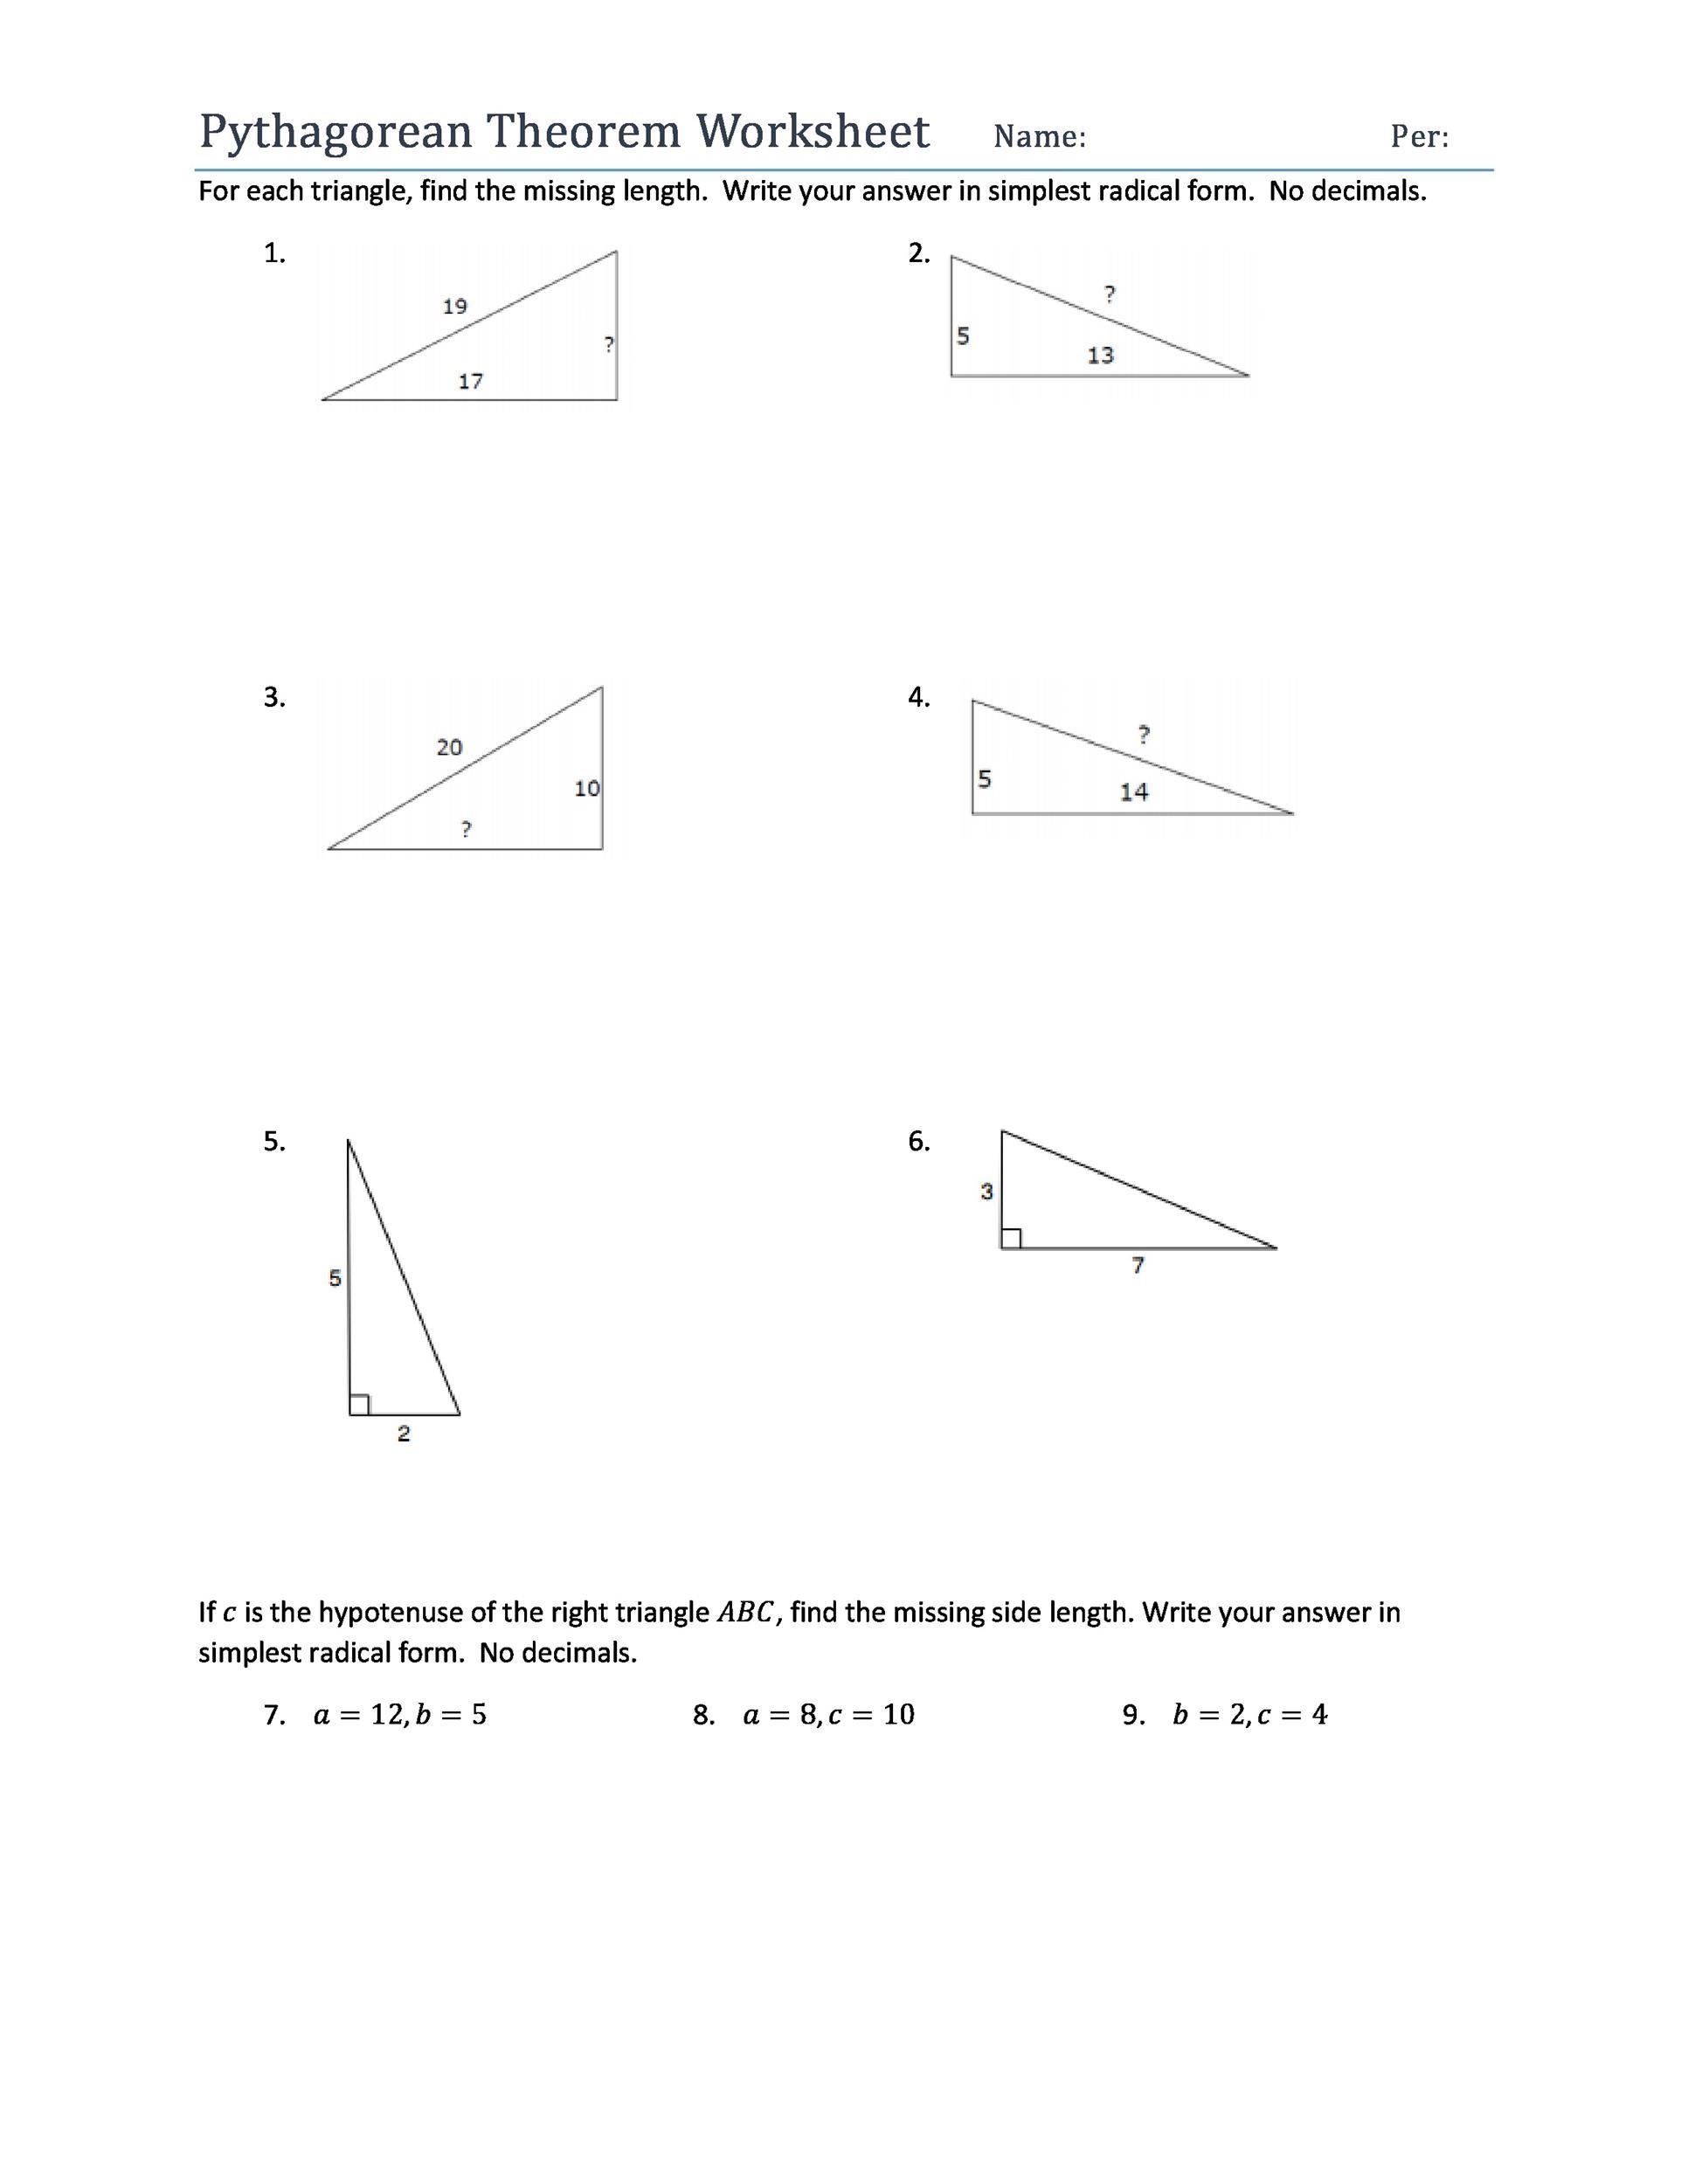 Free pythagorean theorem 21